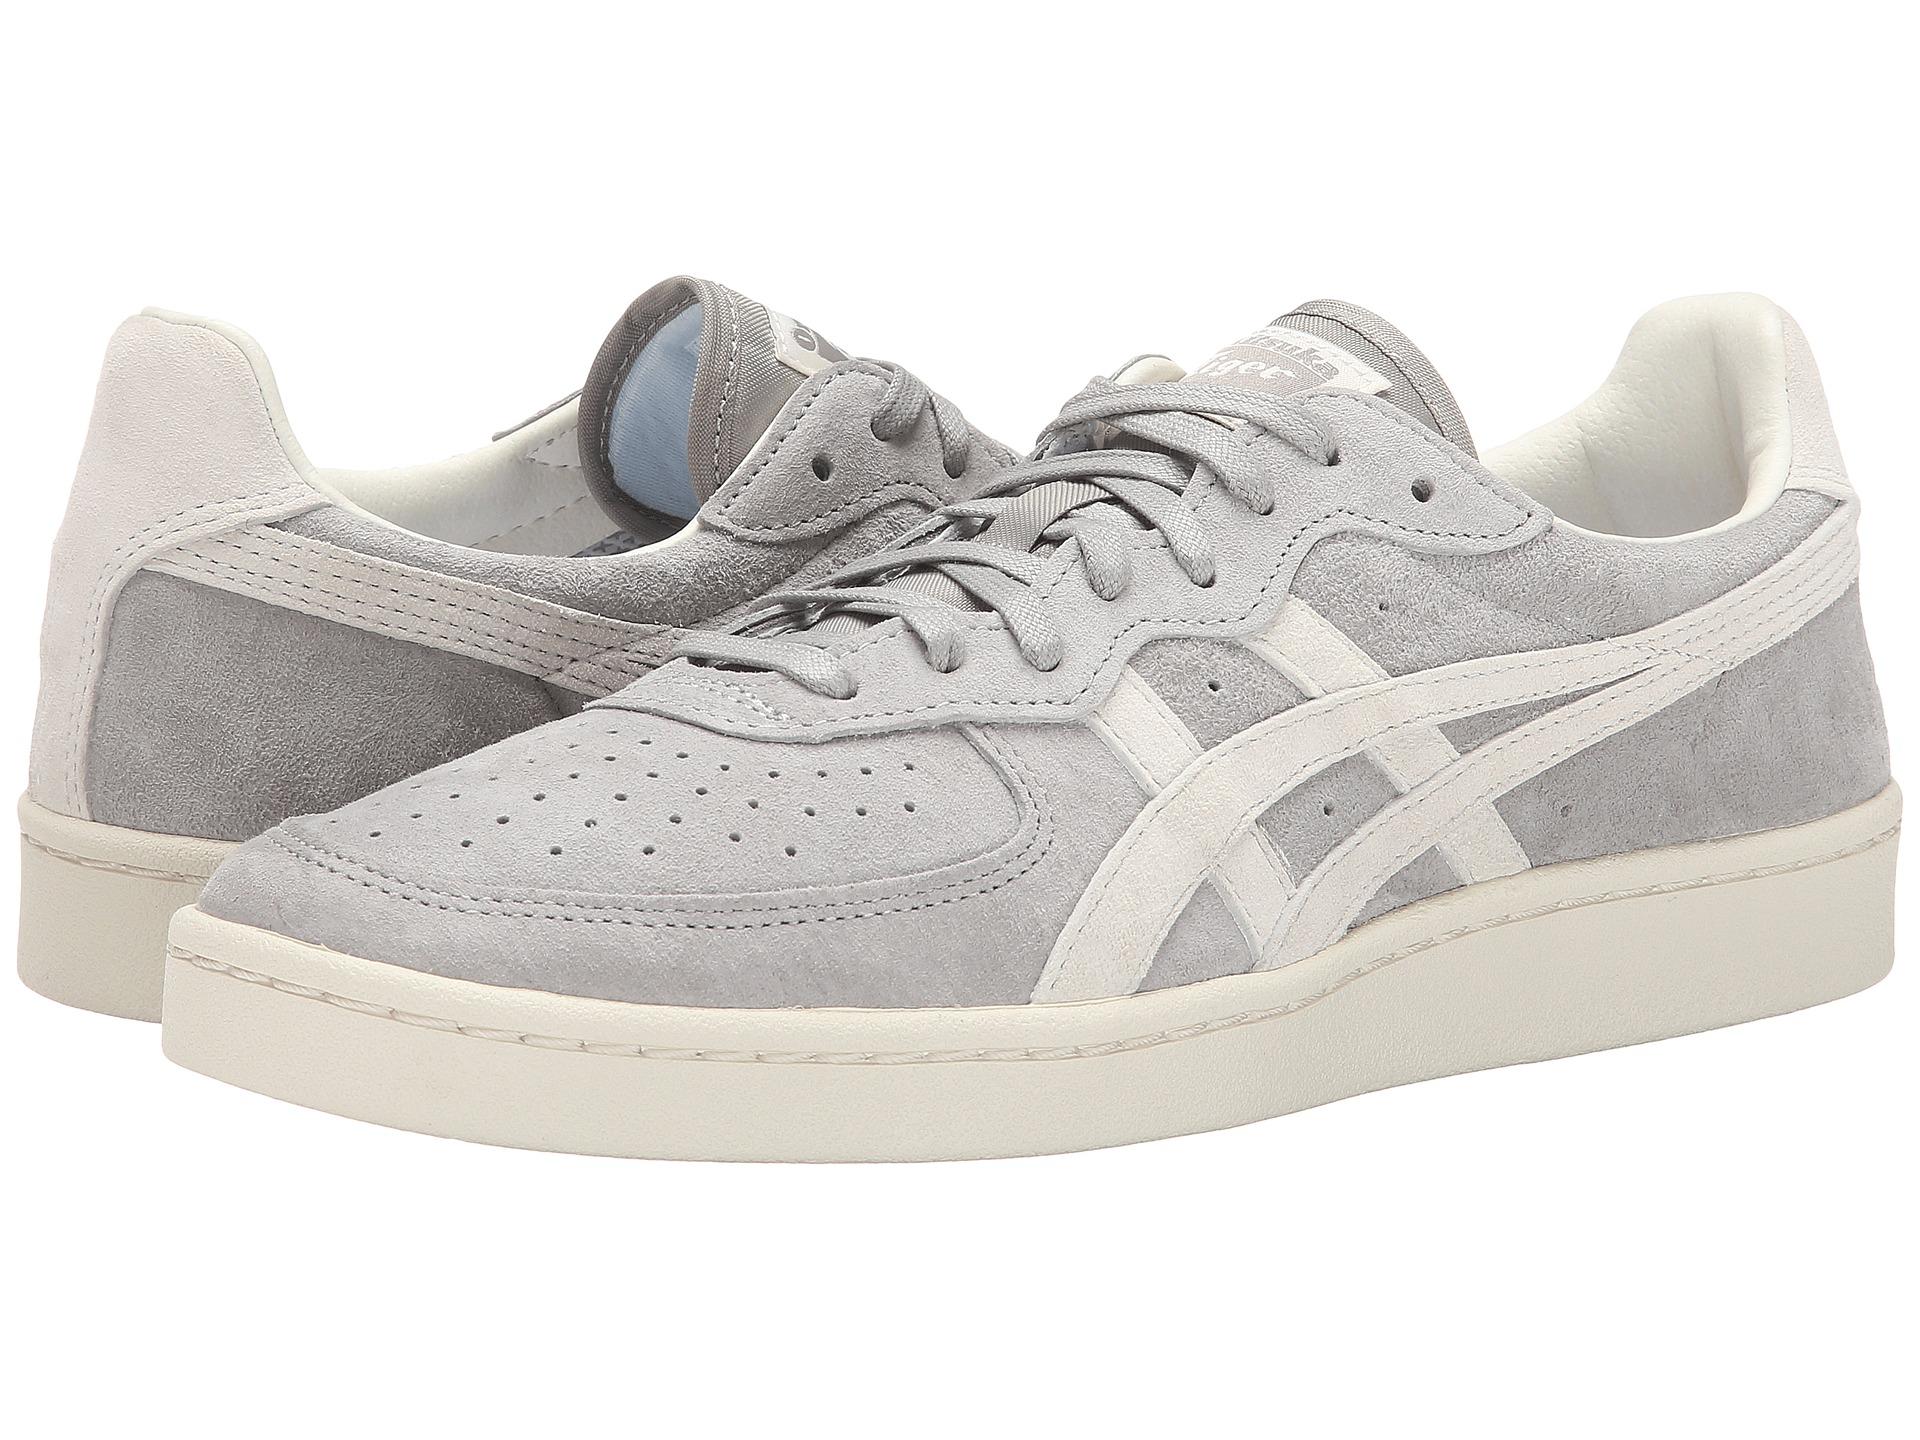 new concept fdf83 c7e19 onitsuka tiger tennis shoes